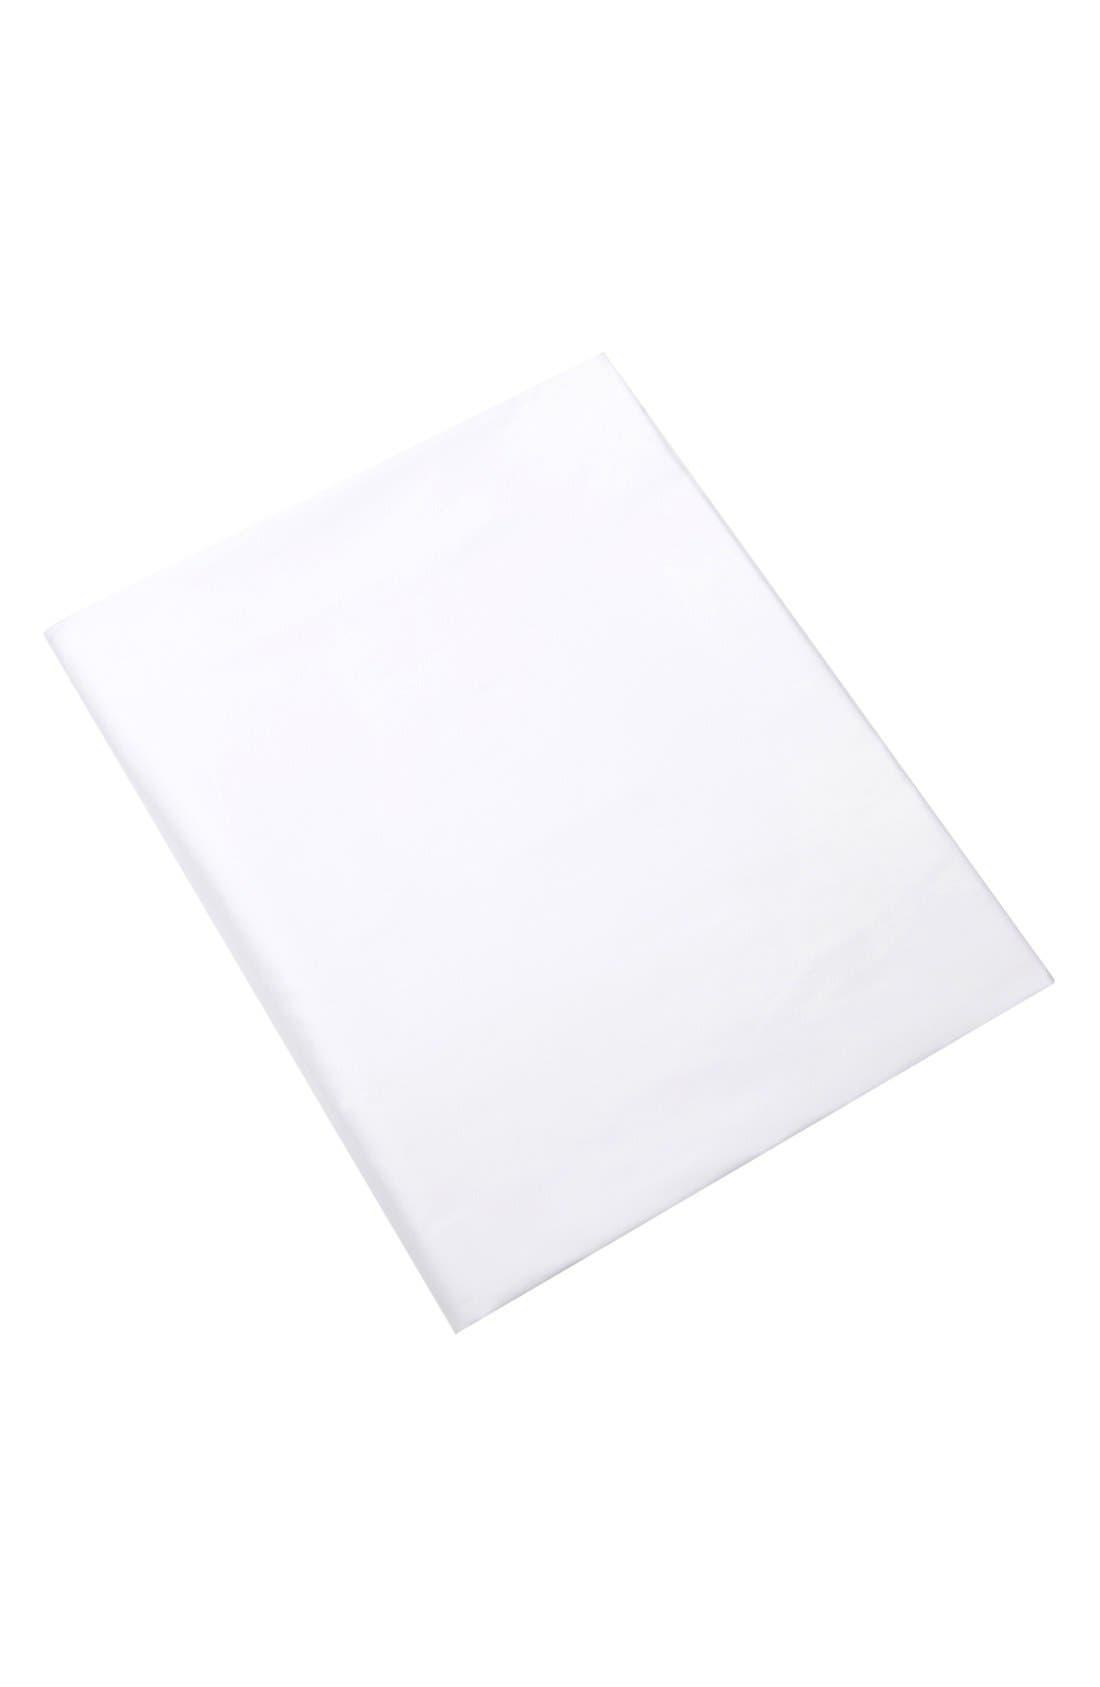 Alternate Image 1 Selected - Blissliving Home 'Mayfair White' Fitted Sheet